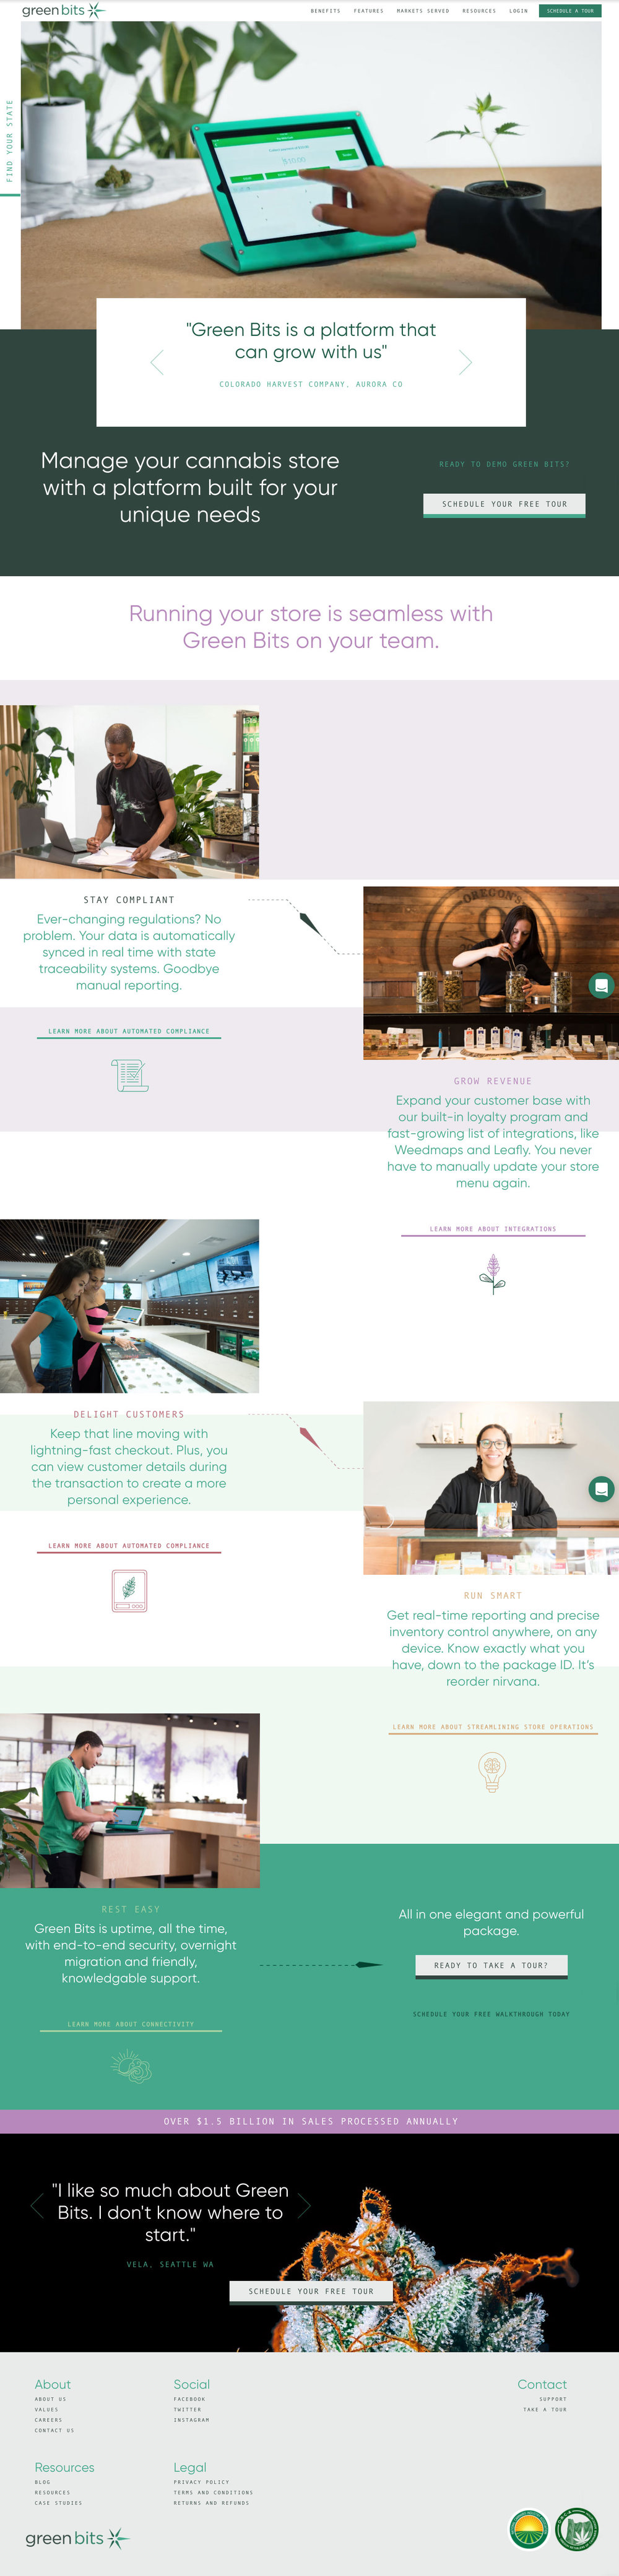 greenbits-site.jpg